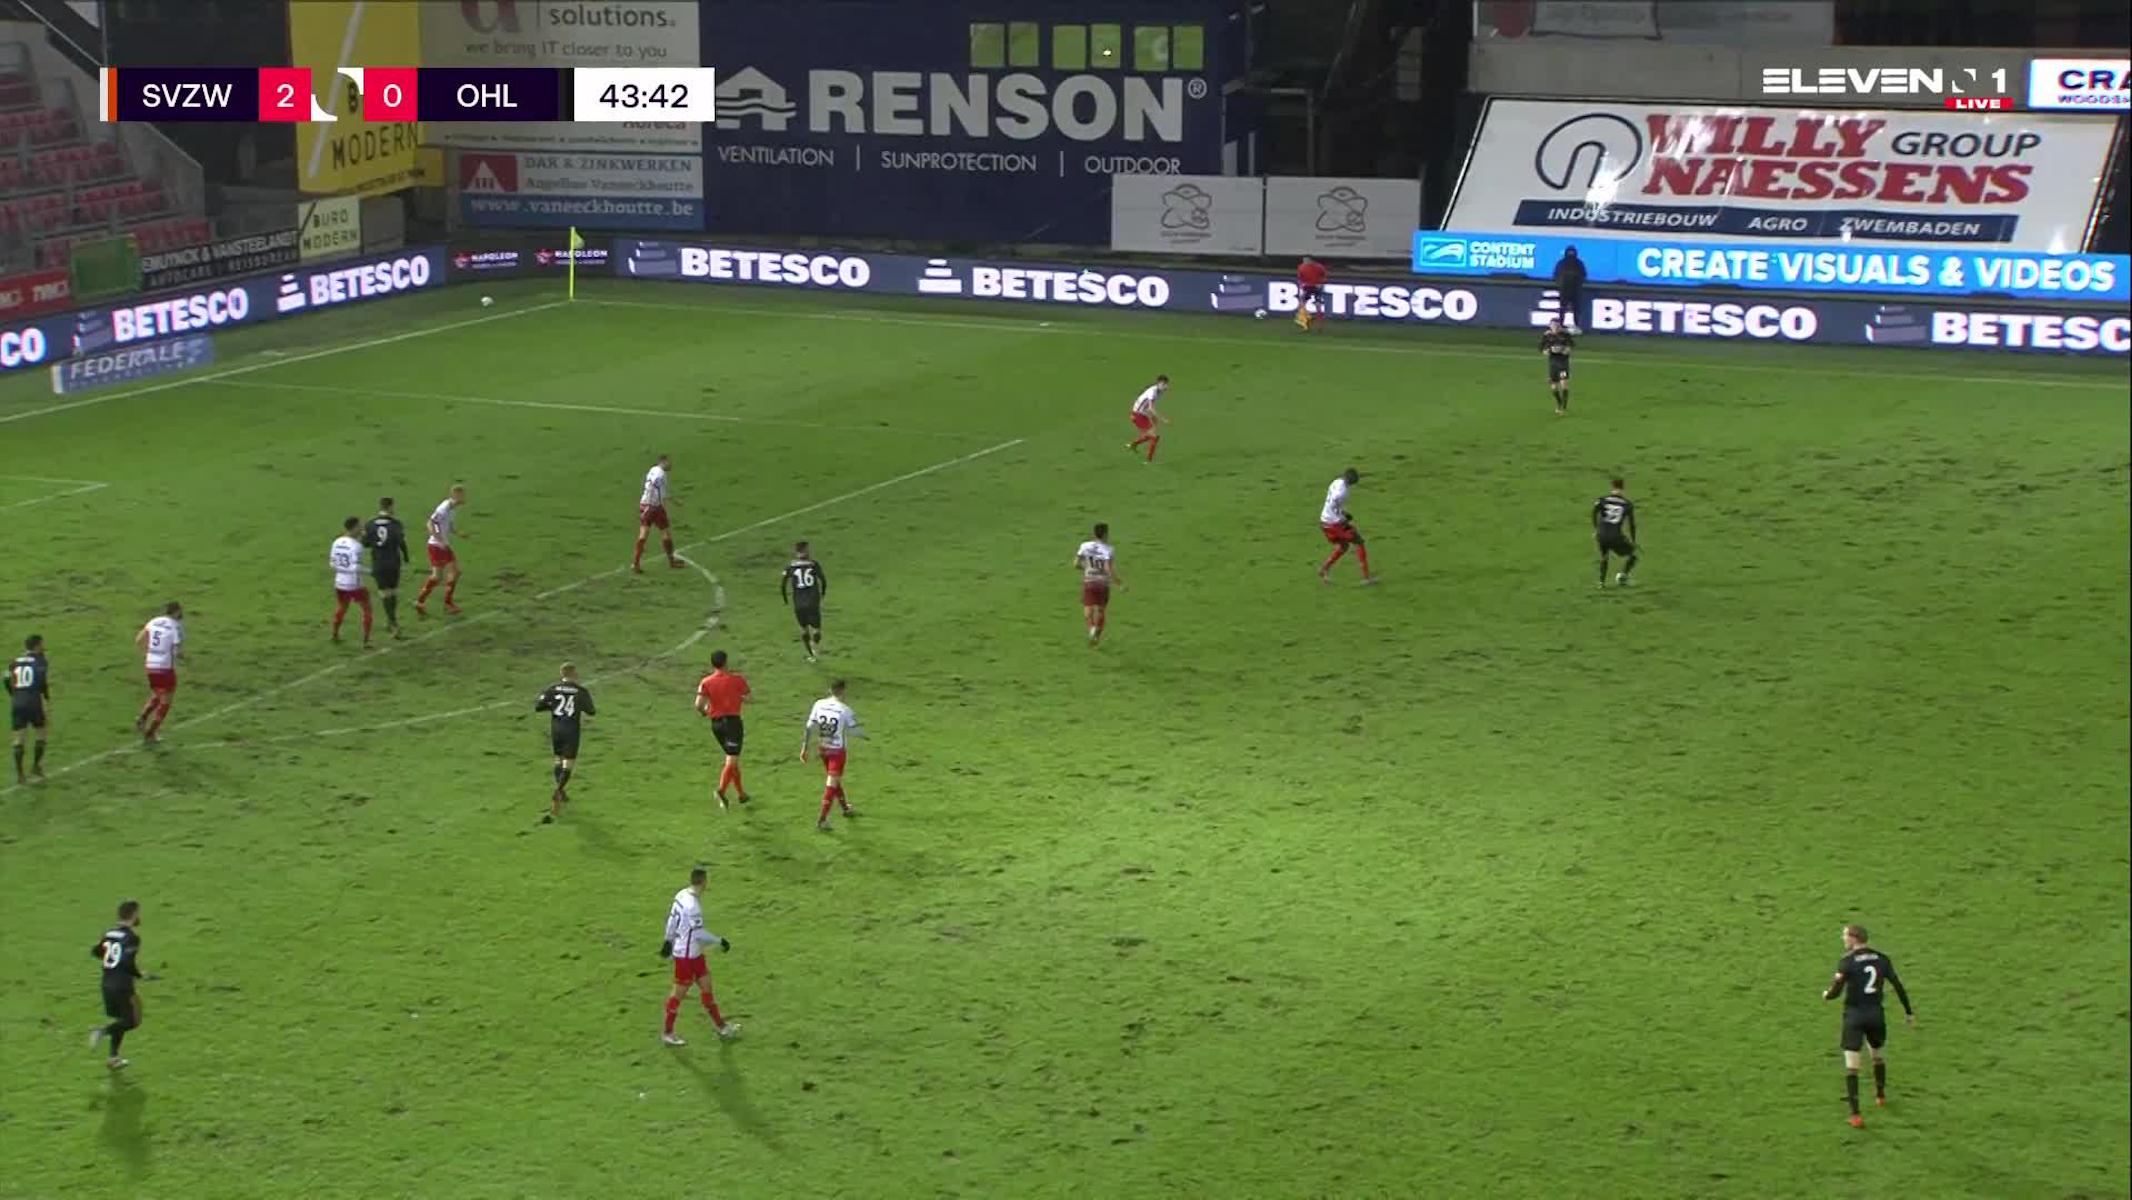 Doelpunt Xavier Mercier (SV Zulte Waregem vs. OH Leuven)